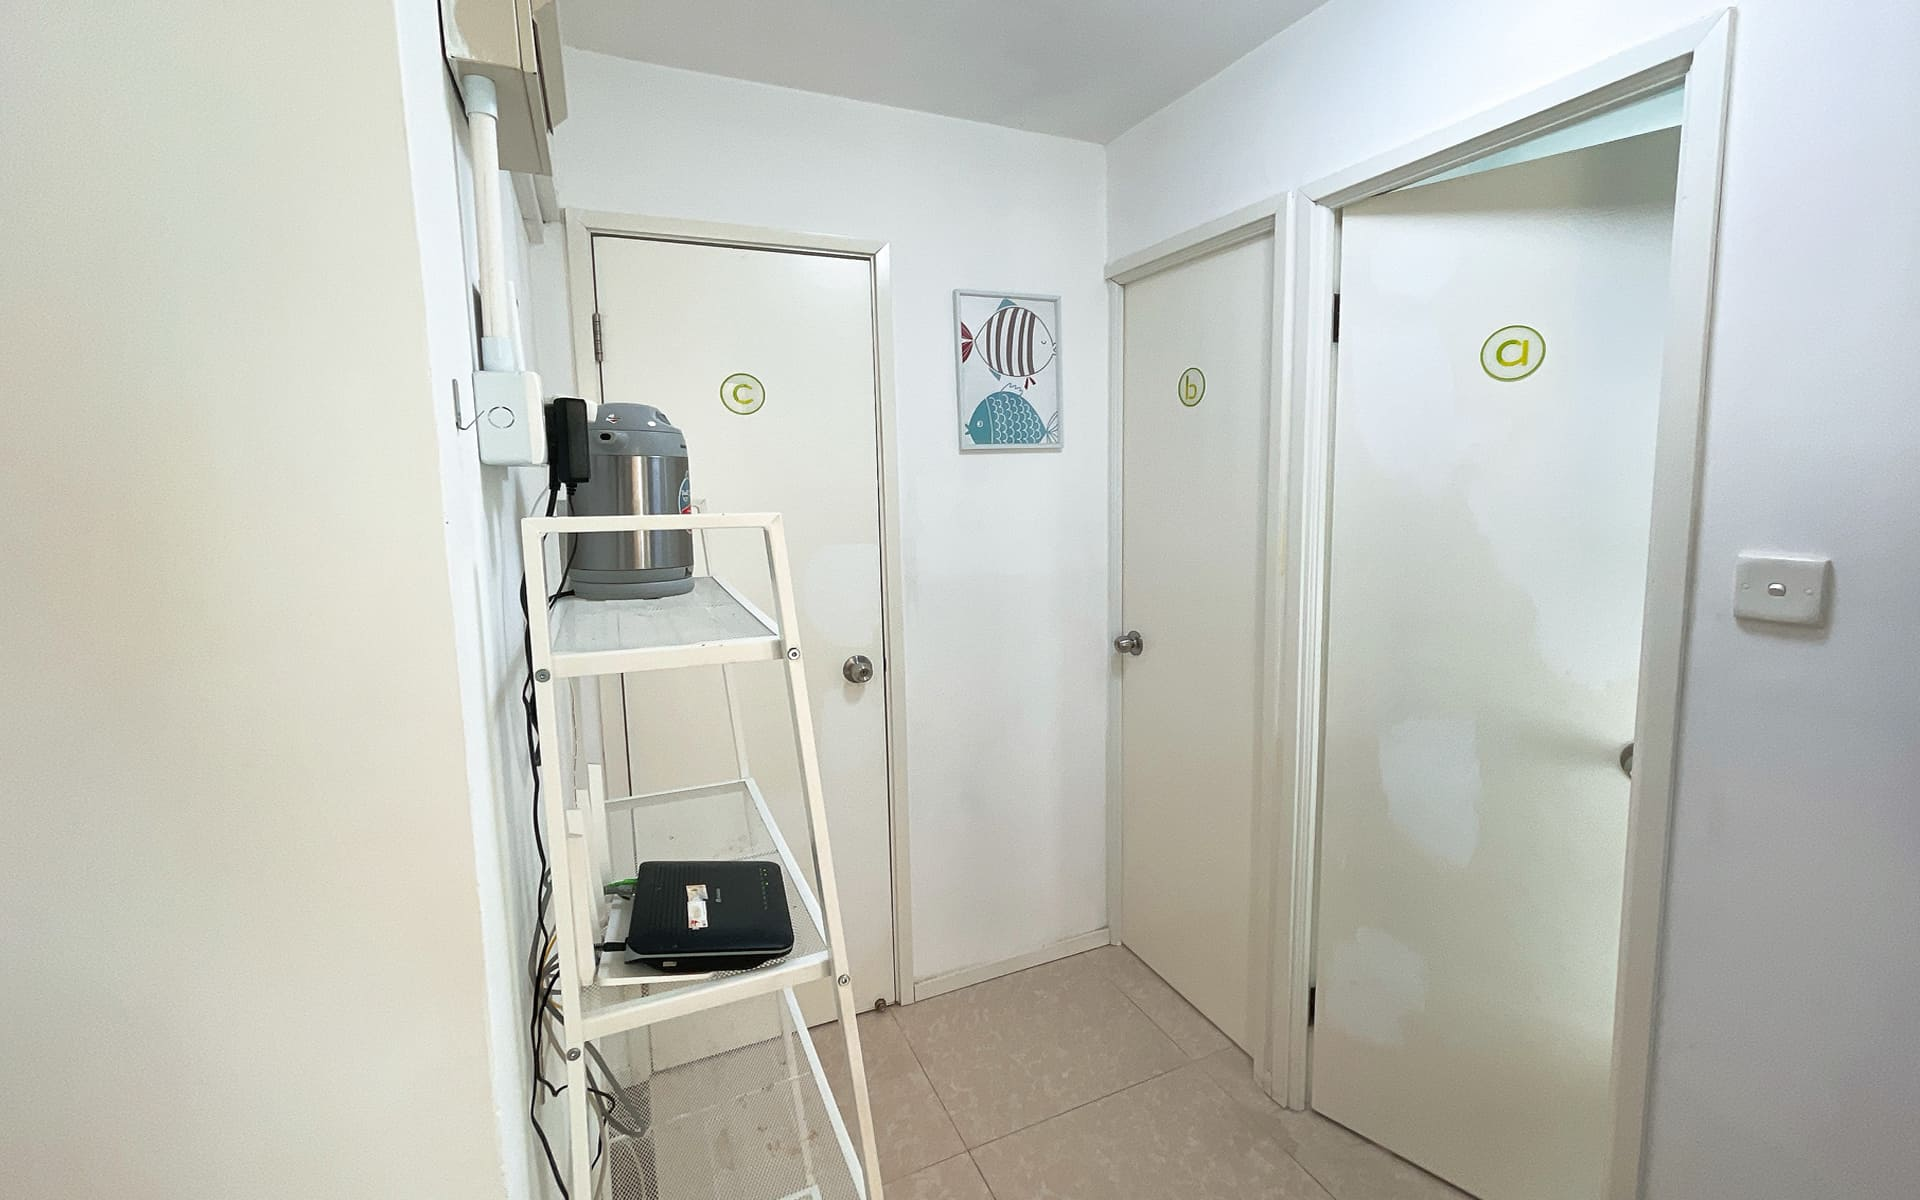 hk_service_apartment_4232557341629432910.jpg